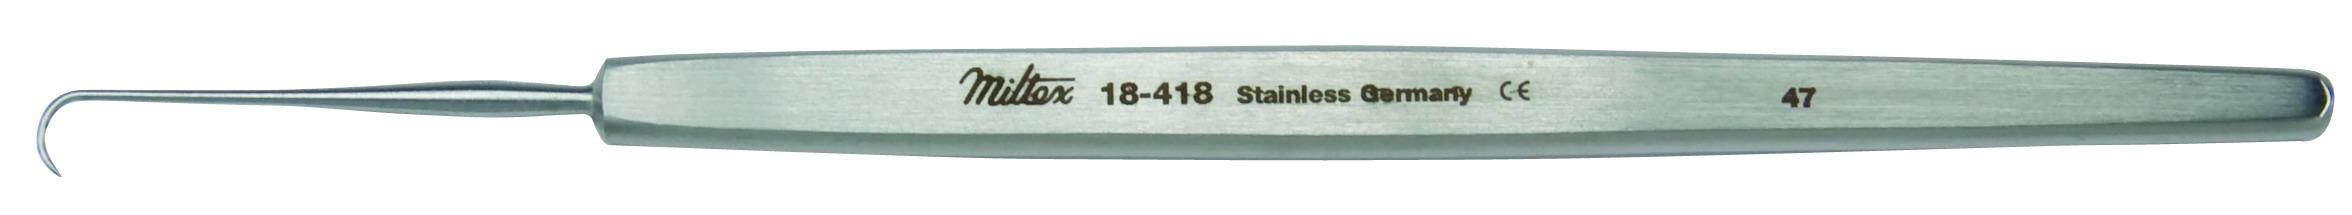 wiener-corneal-hook-sharp-18-418-miltex.jpg